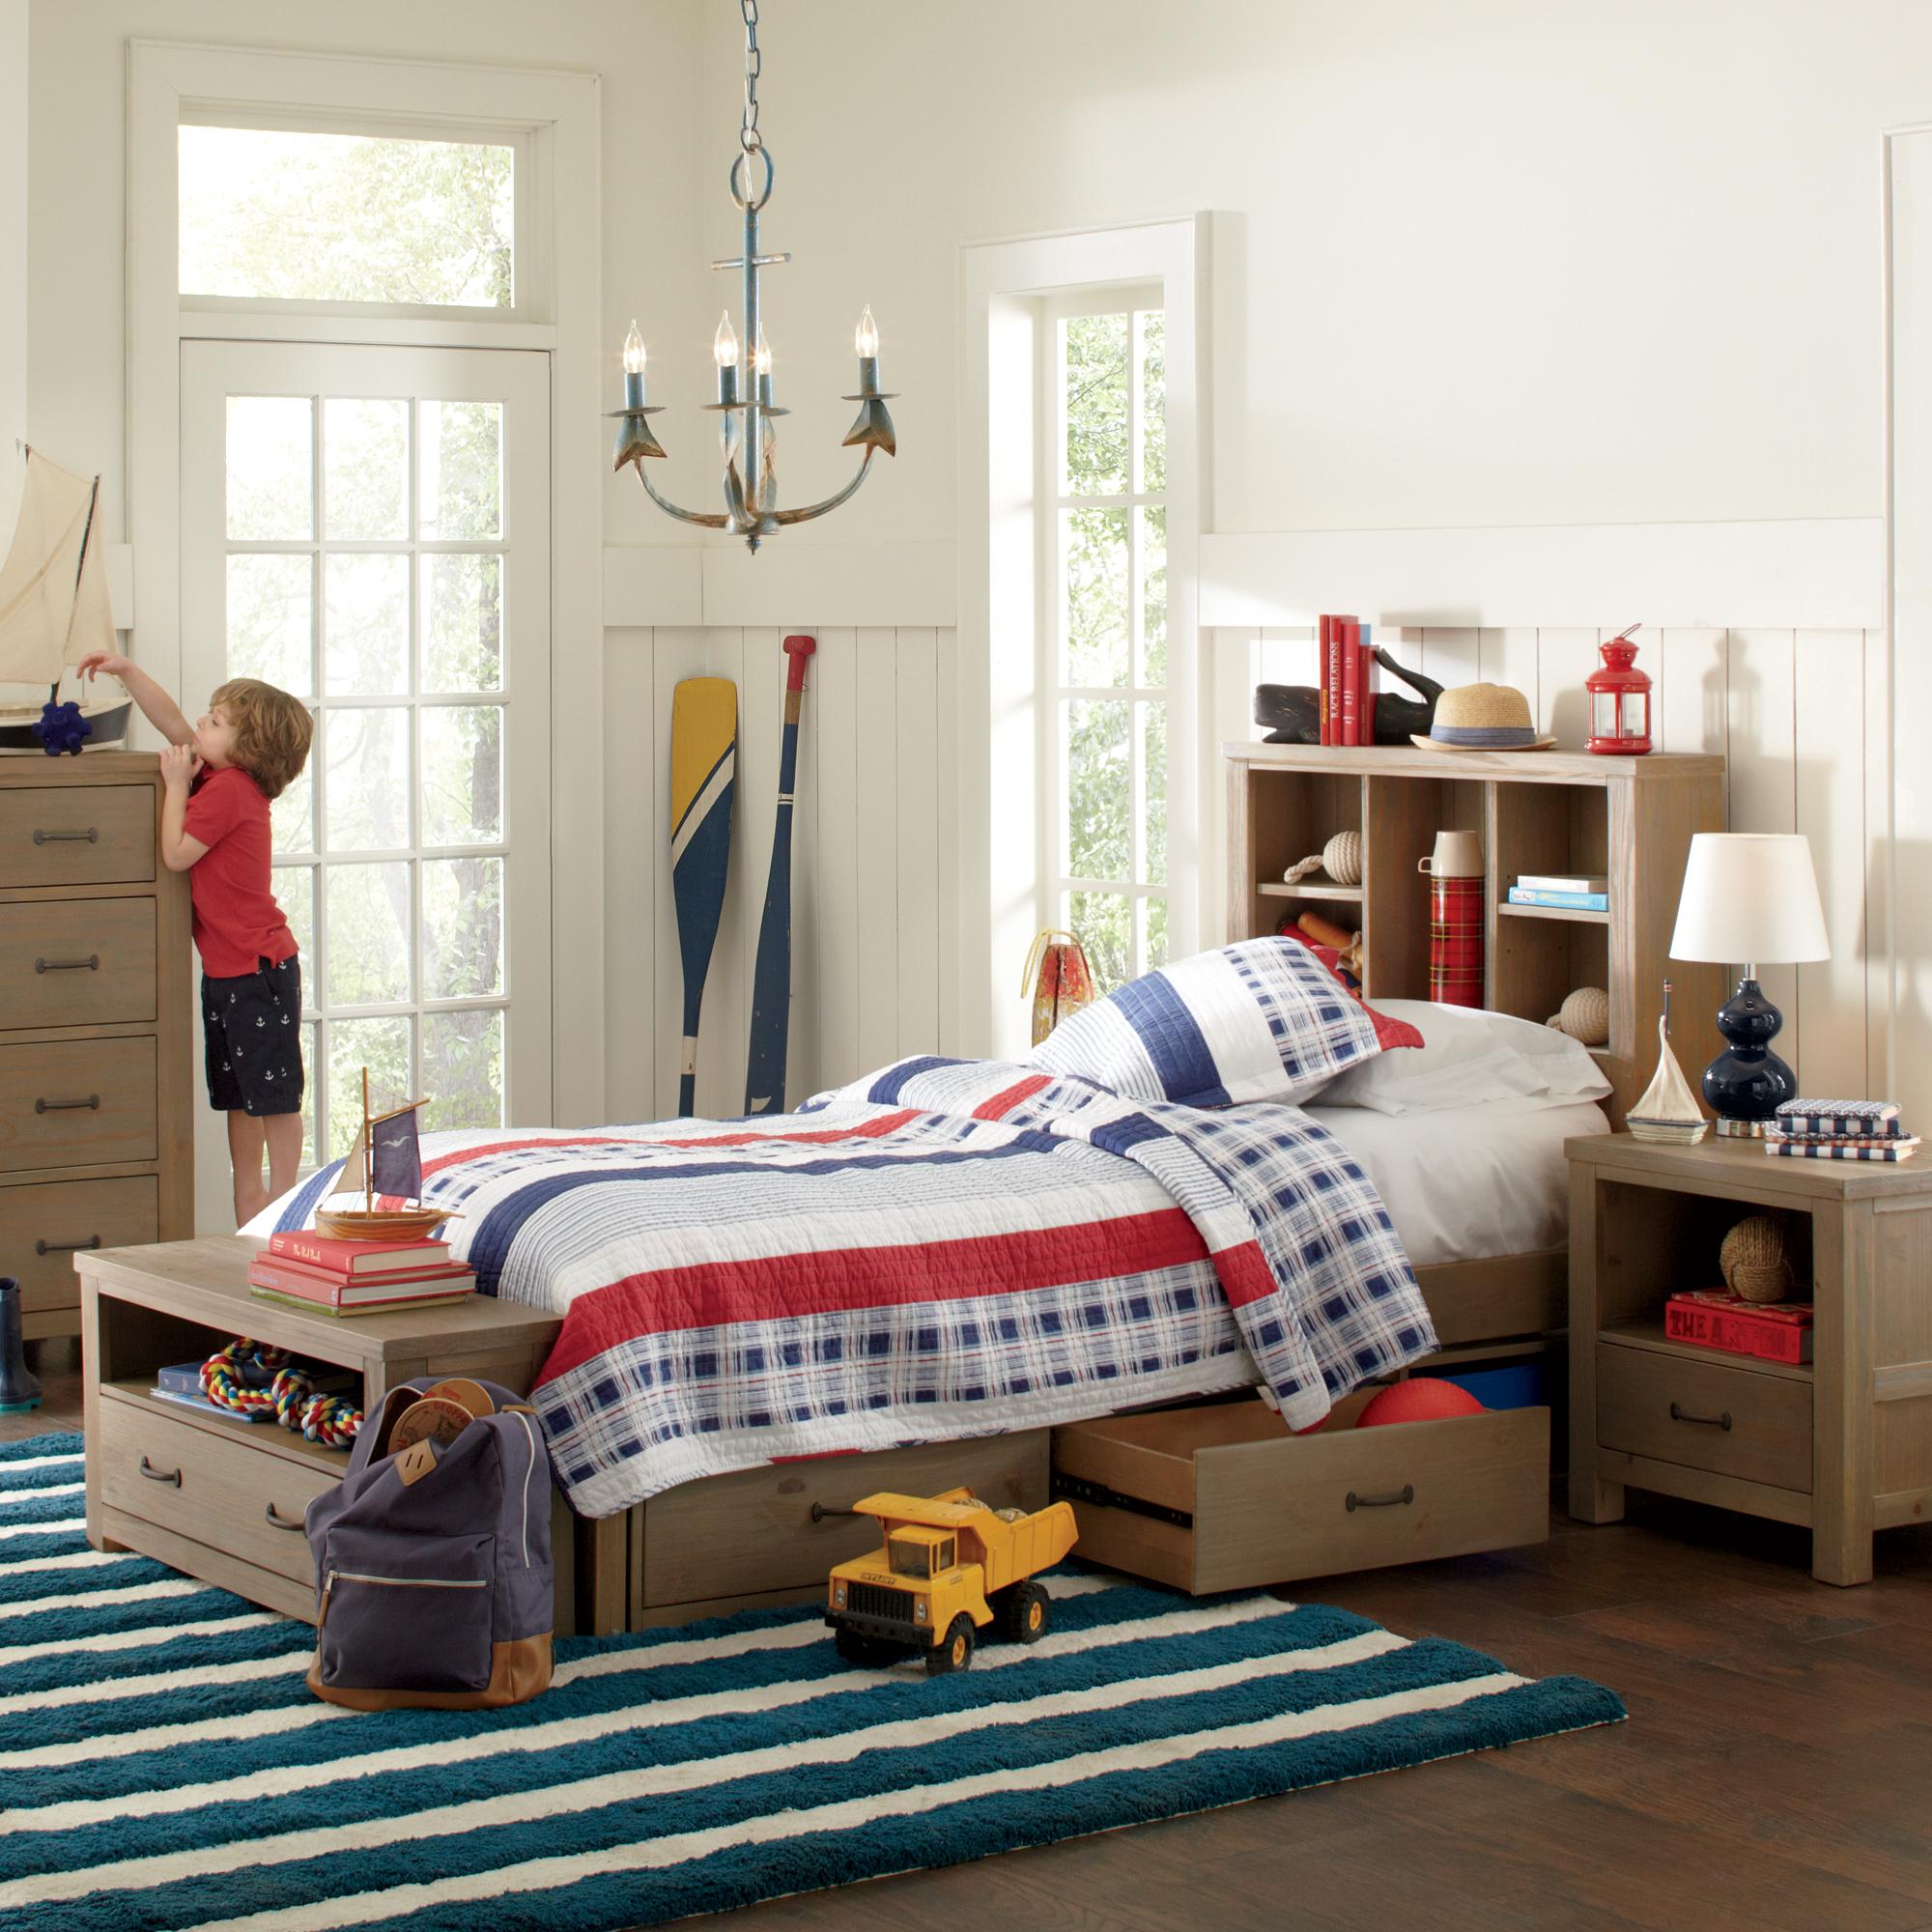 new product 2e5d0 f104f Farmhouse & Rustic Kids Bedroom Furniture | Birch Lane